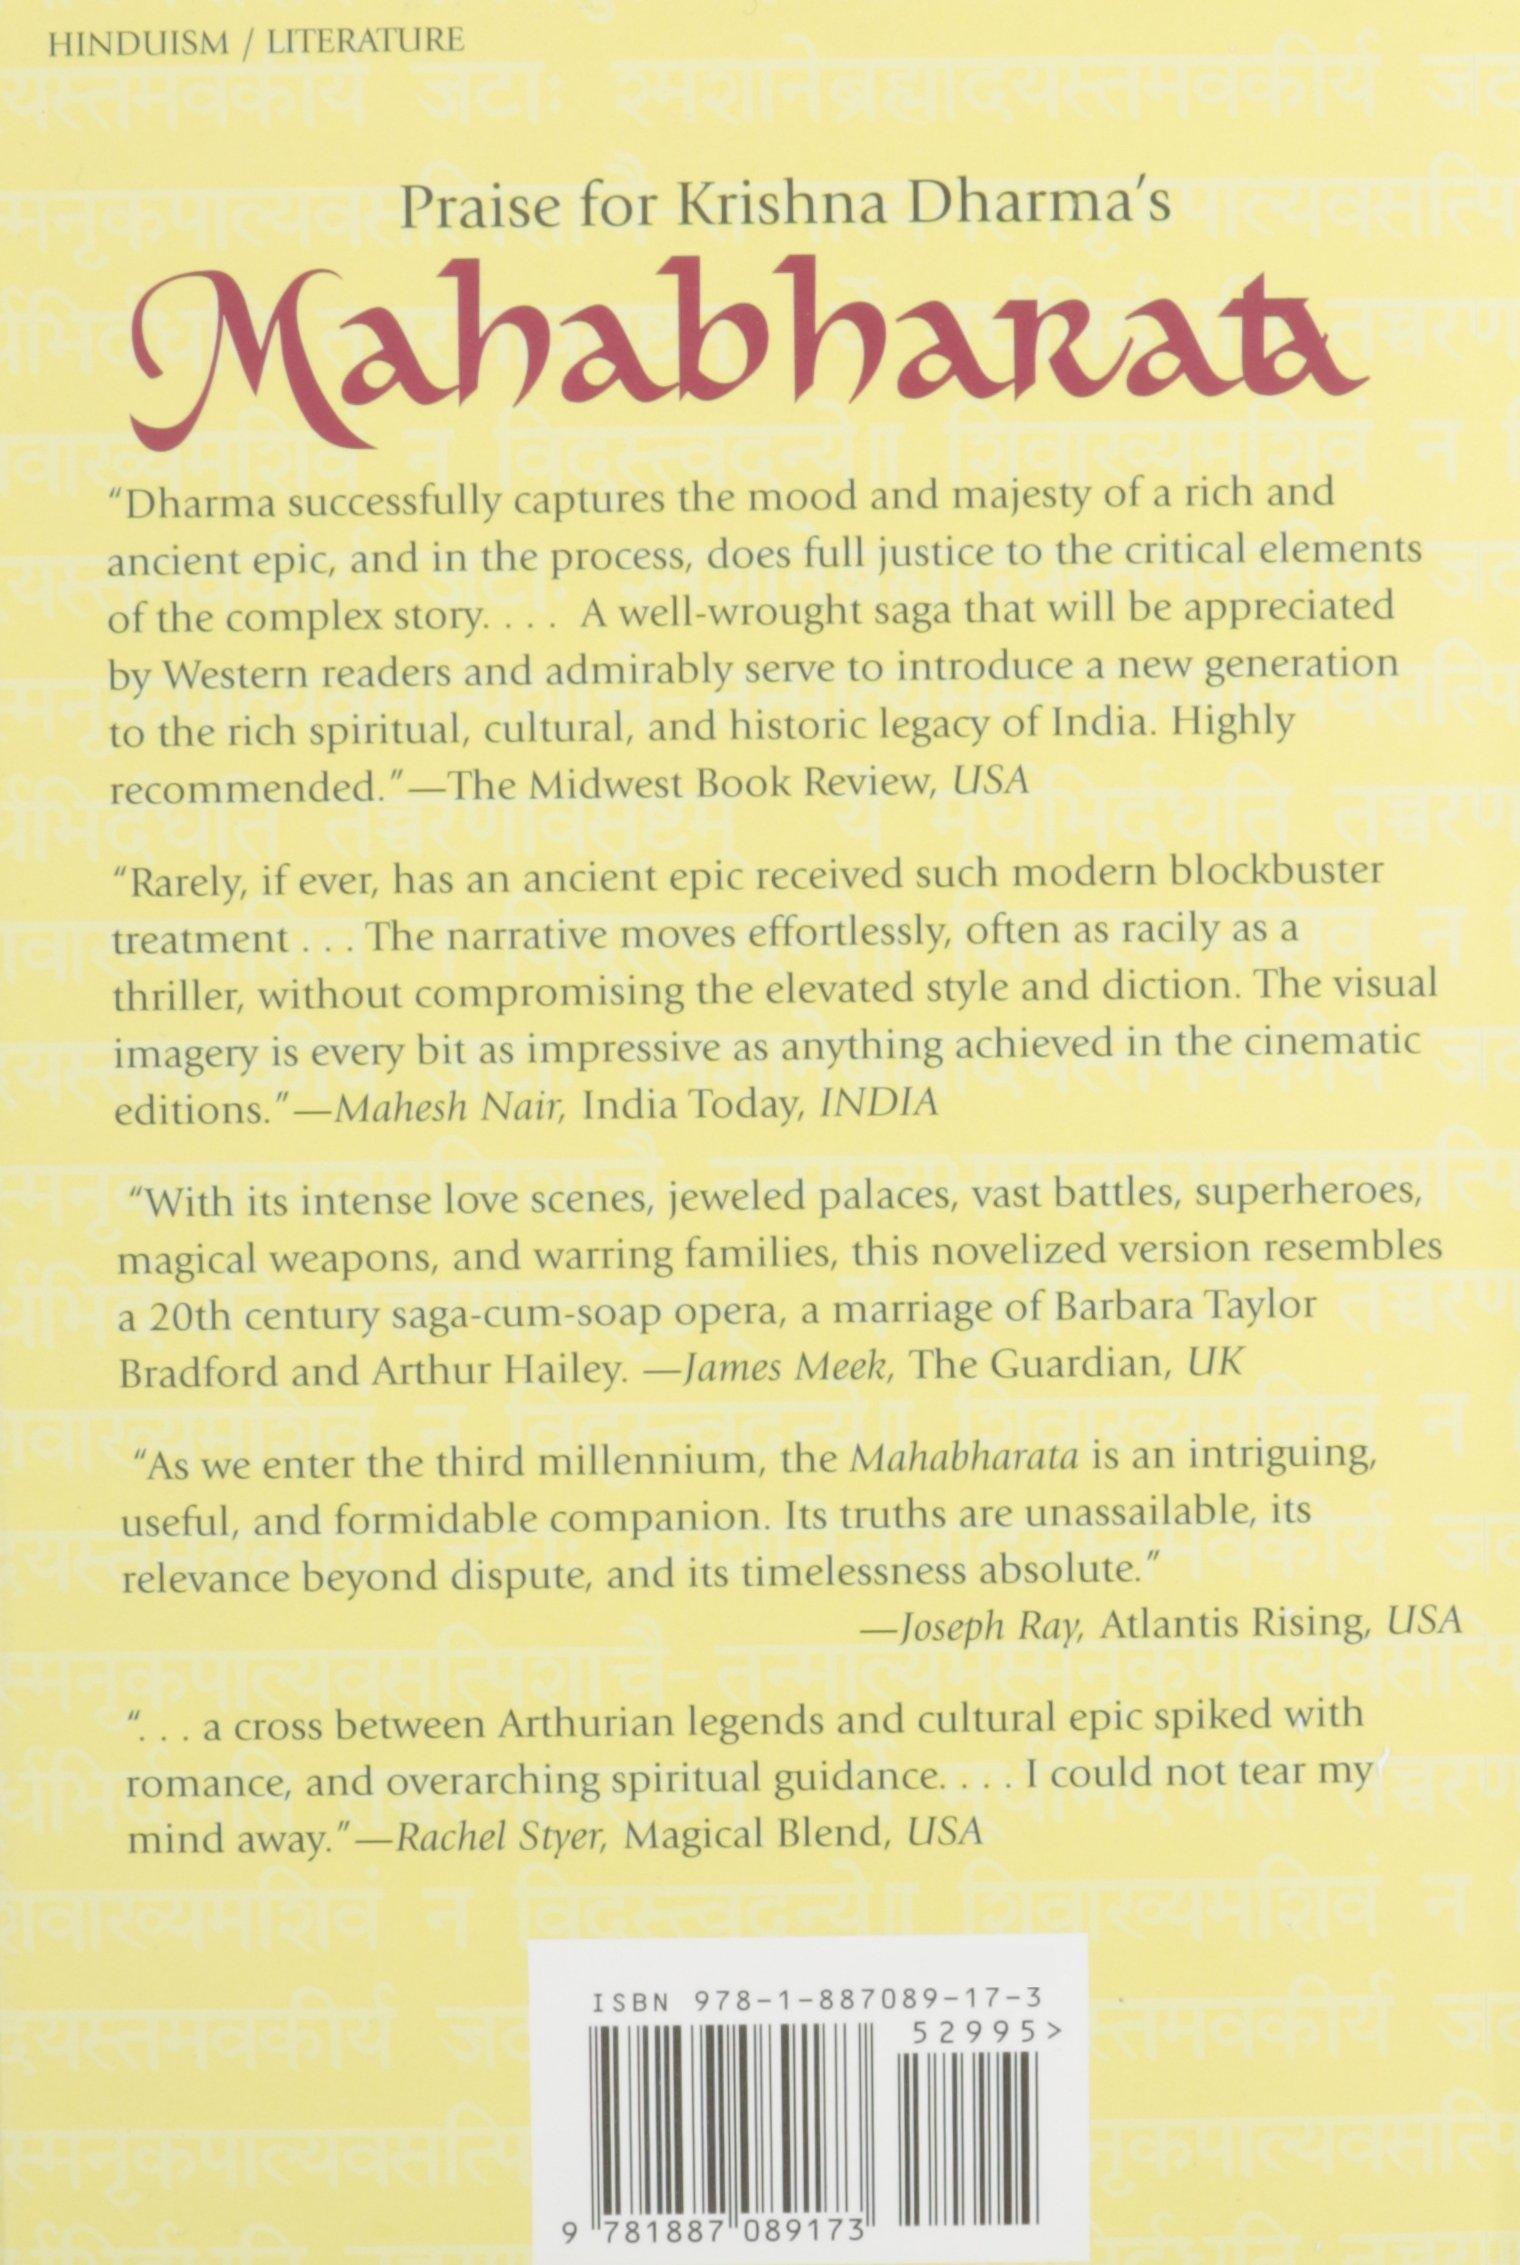 Mahabharat Full Story In Bengali Pdf